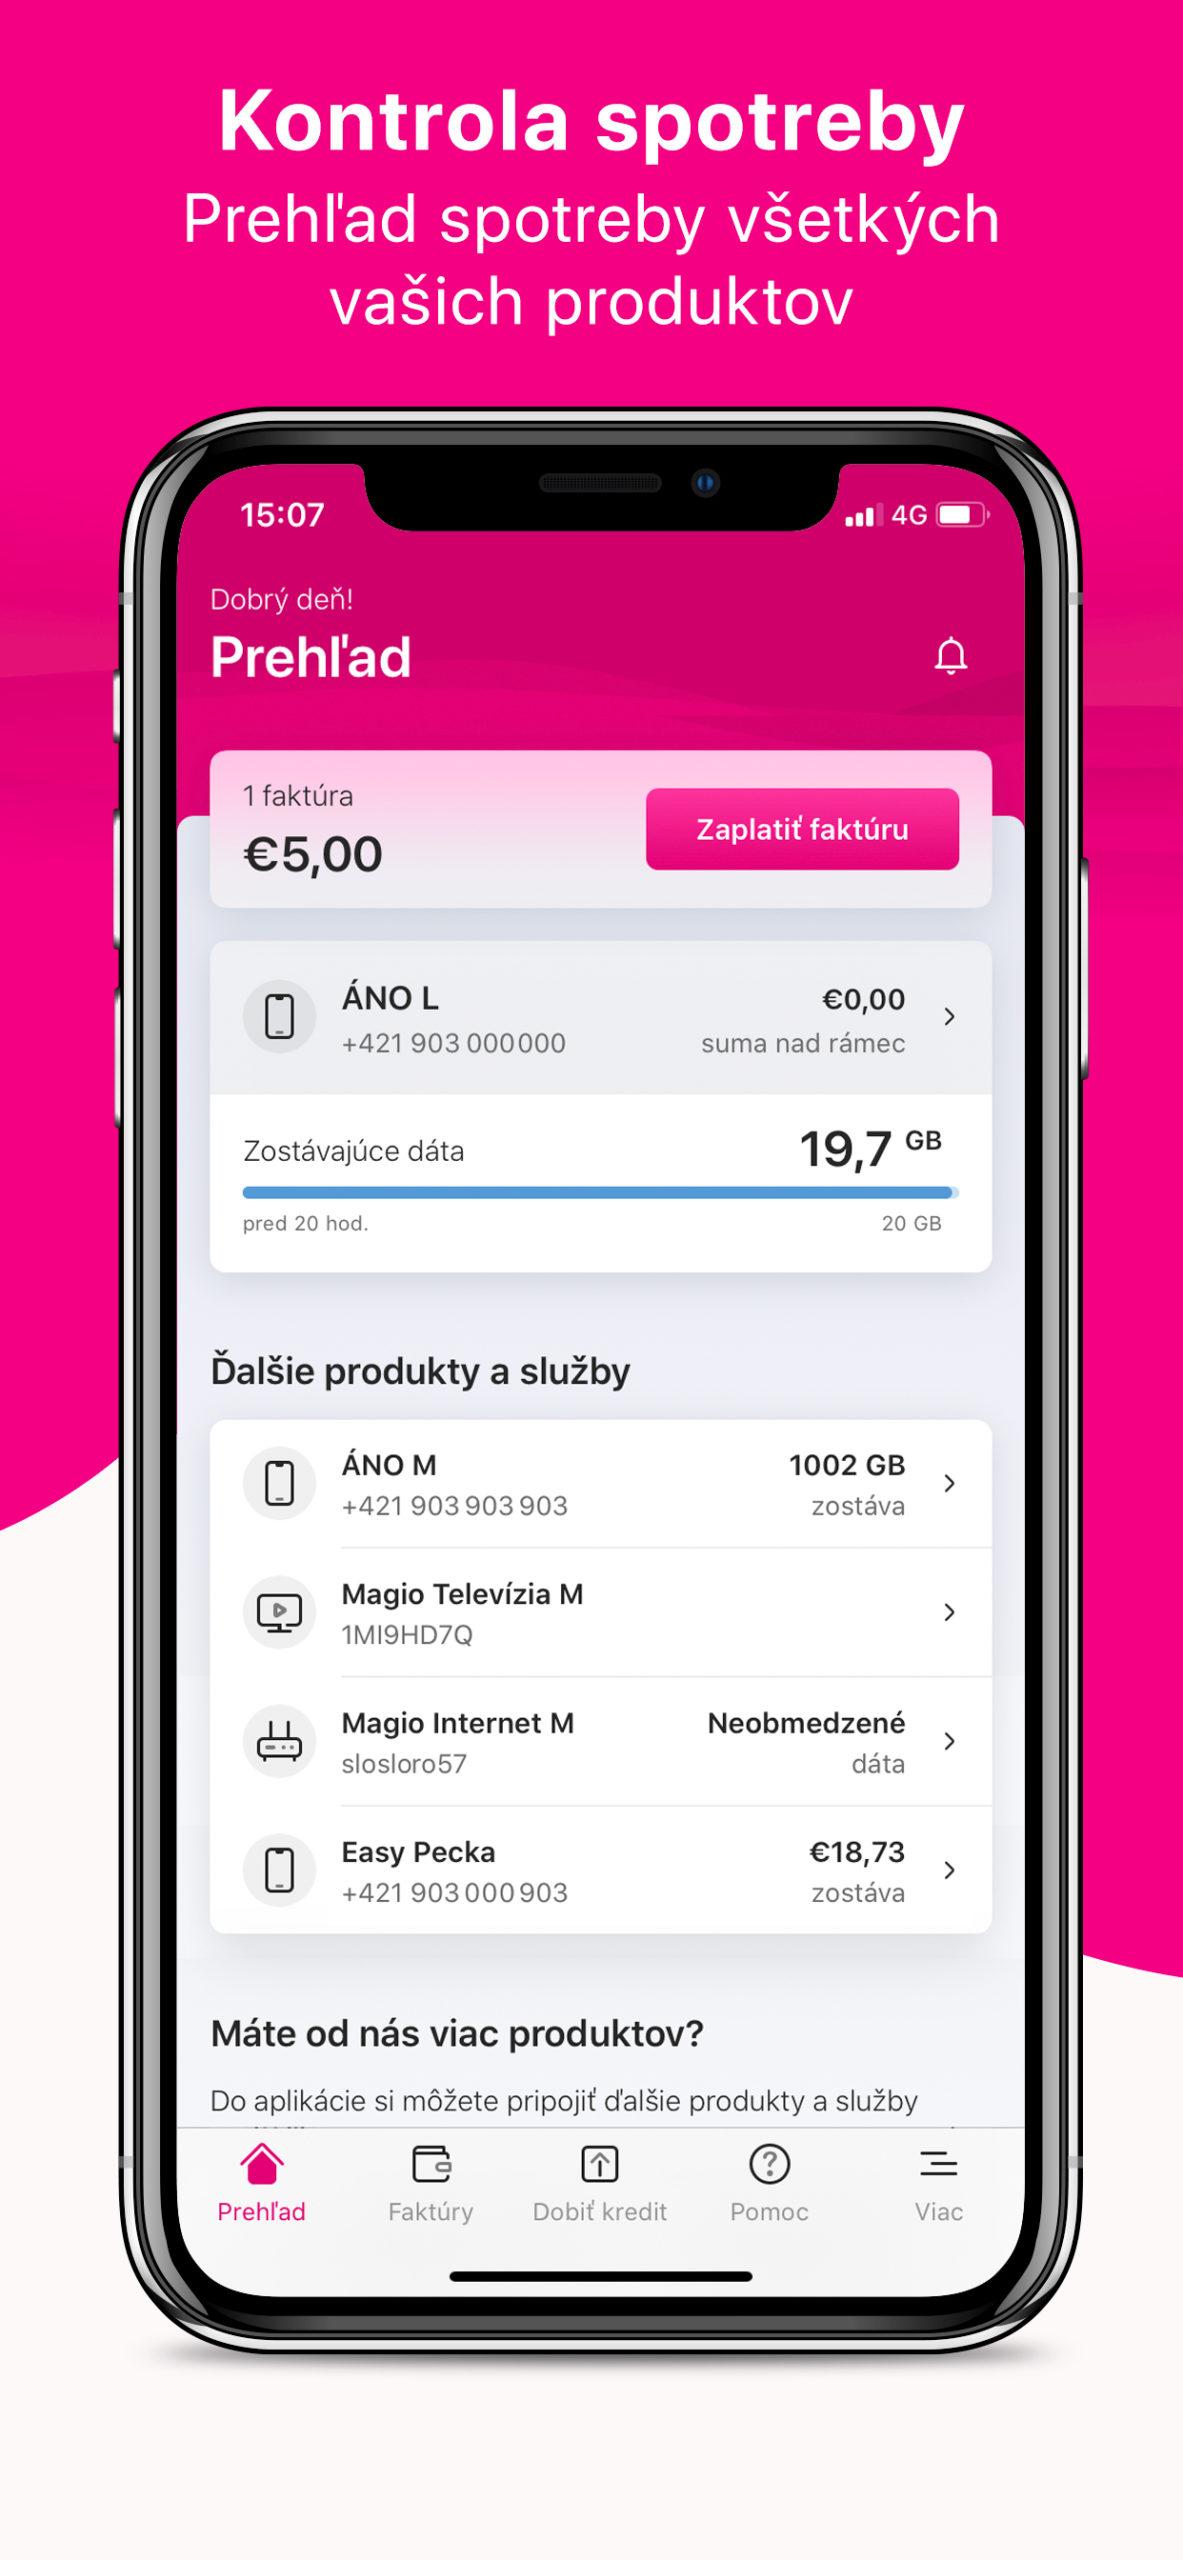 Telekom kontrola spotreby